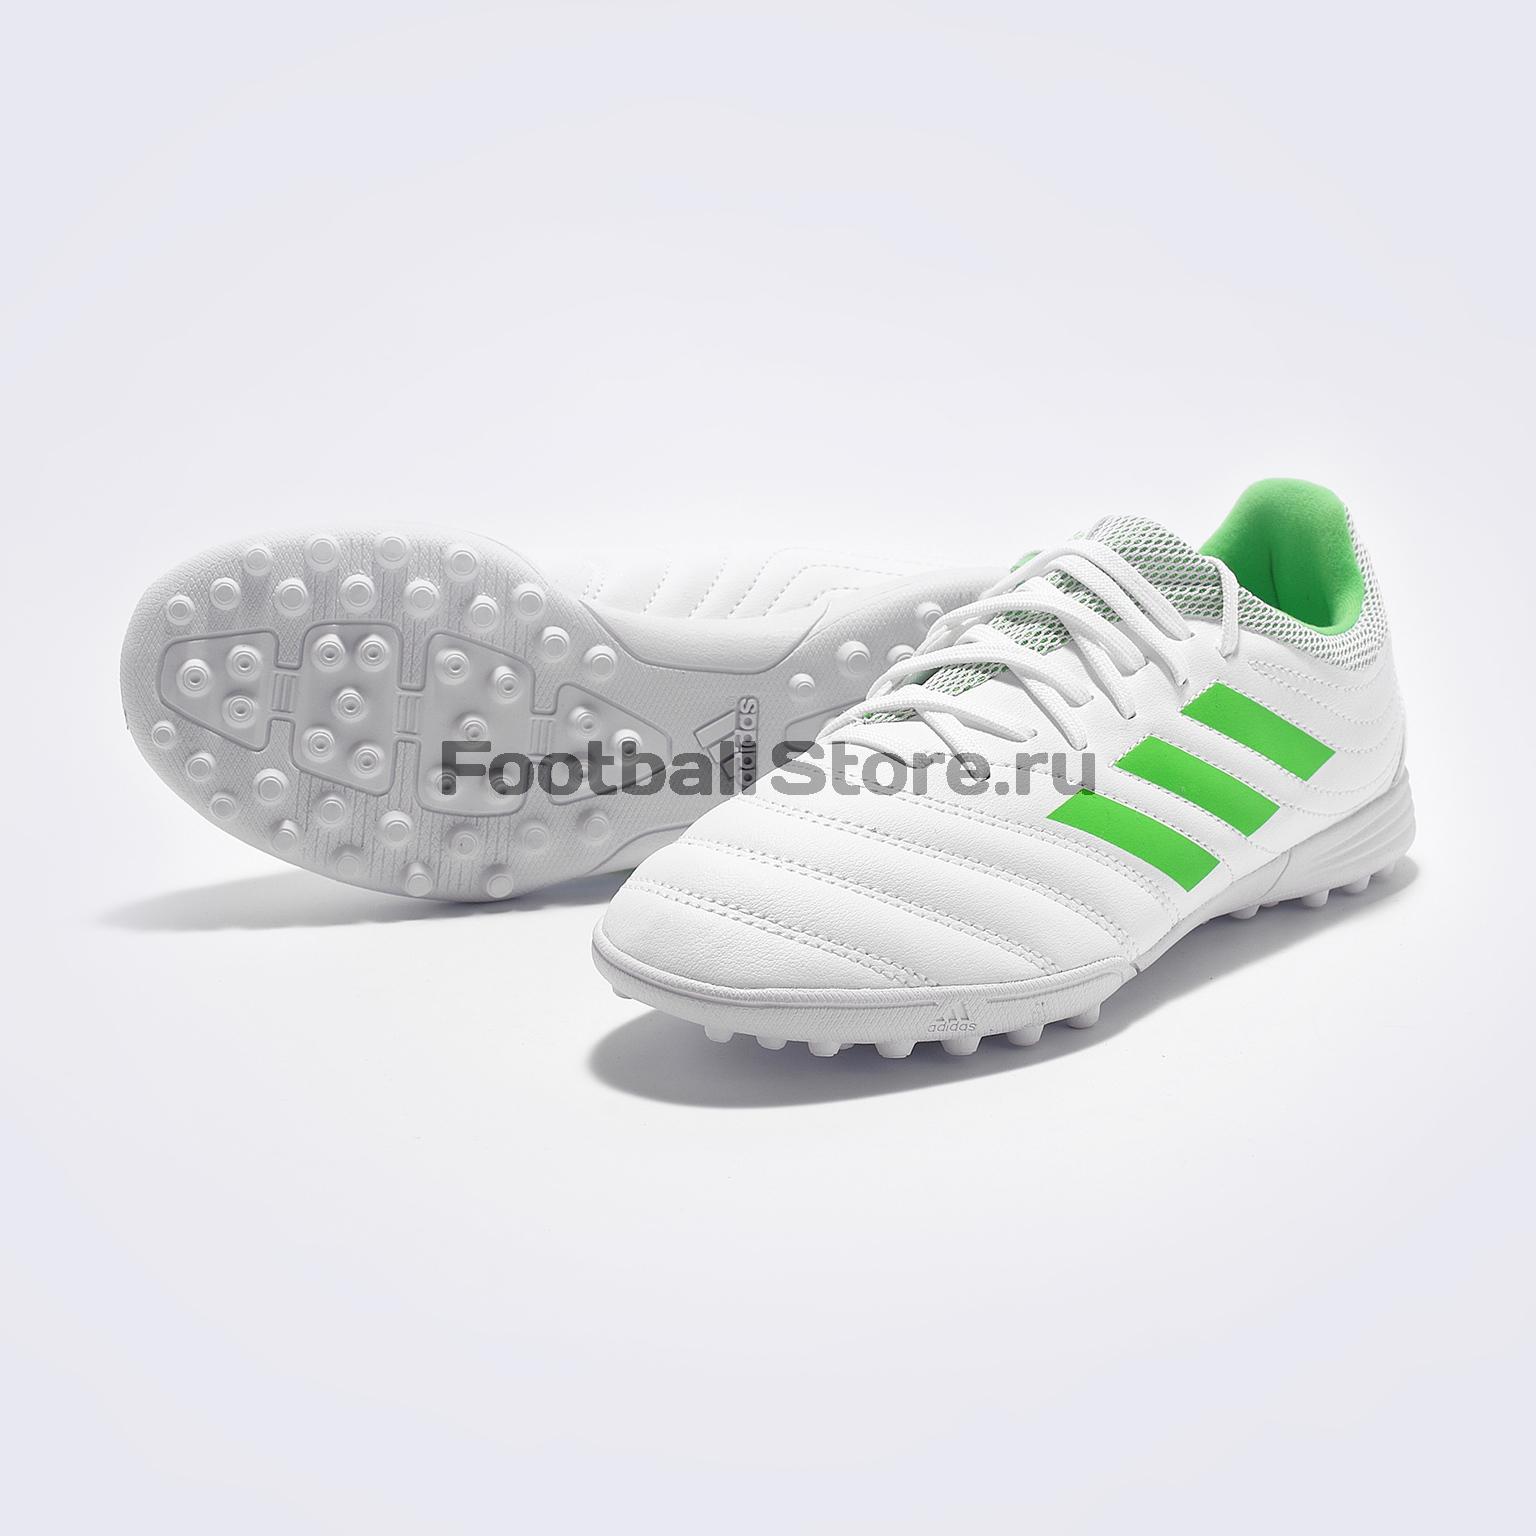 Шиповки детские Adidas Copa 19.3 TF D98086 шиповки детские adidas x tango 18 3 tf db2422